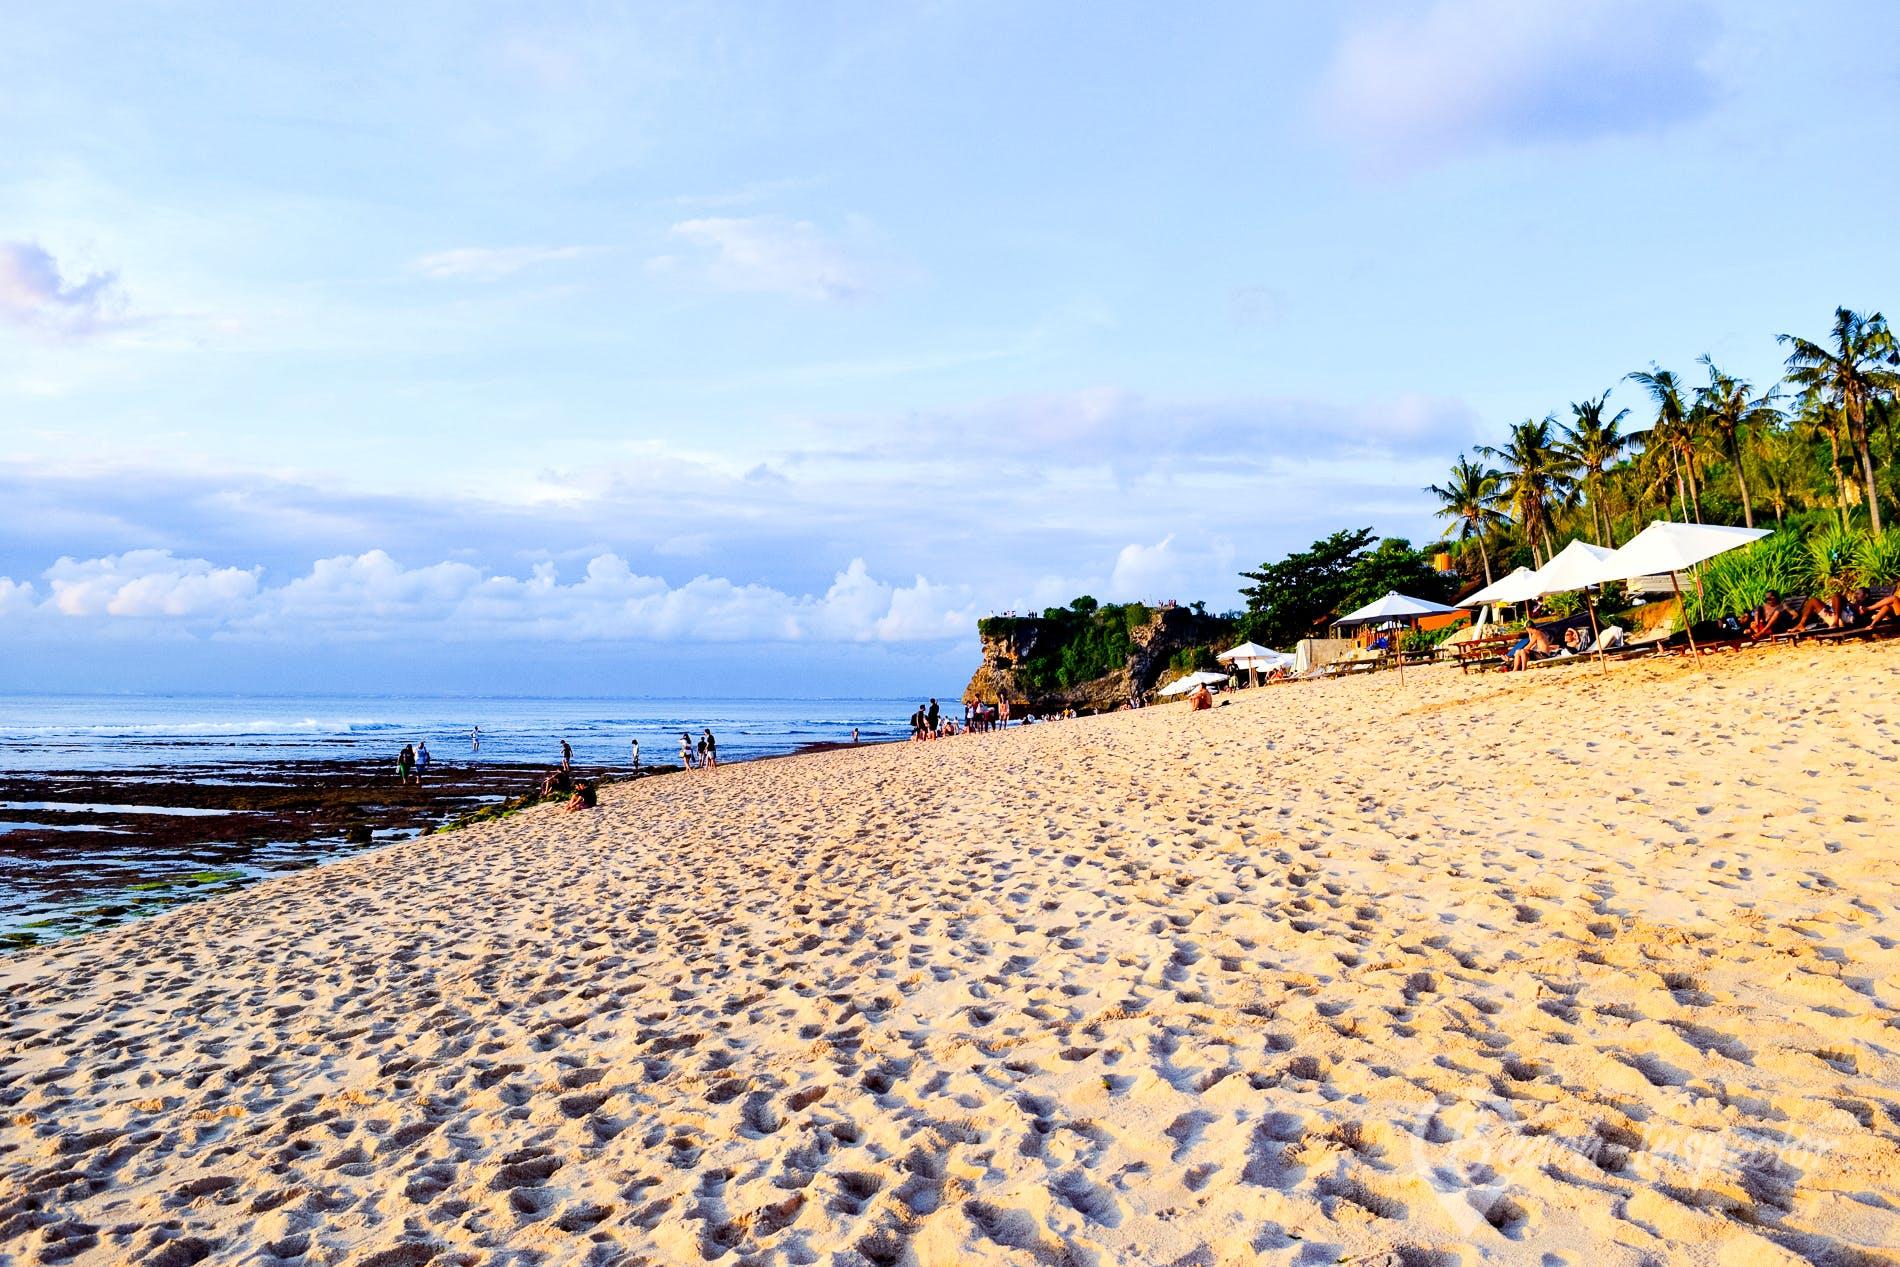 Playa Balangan Beach, Bali, Indonesia